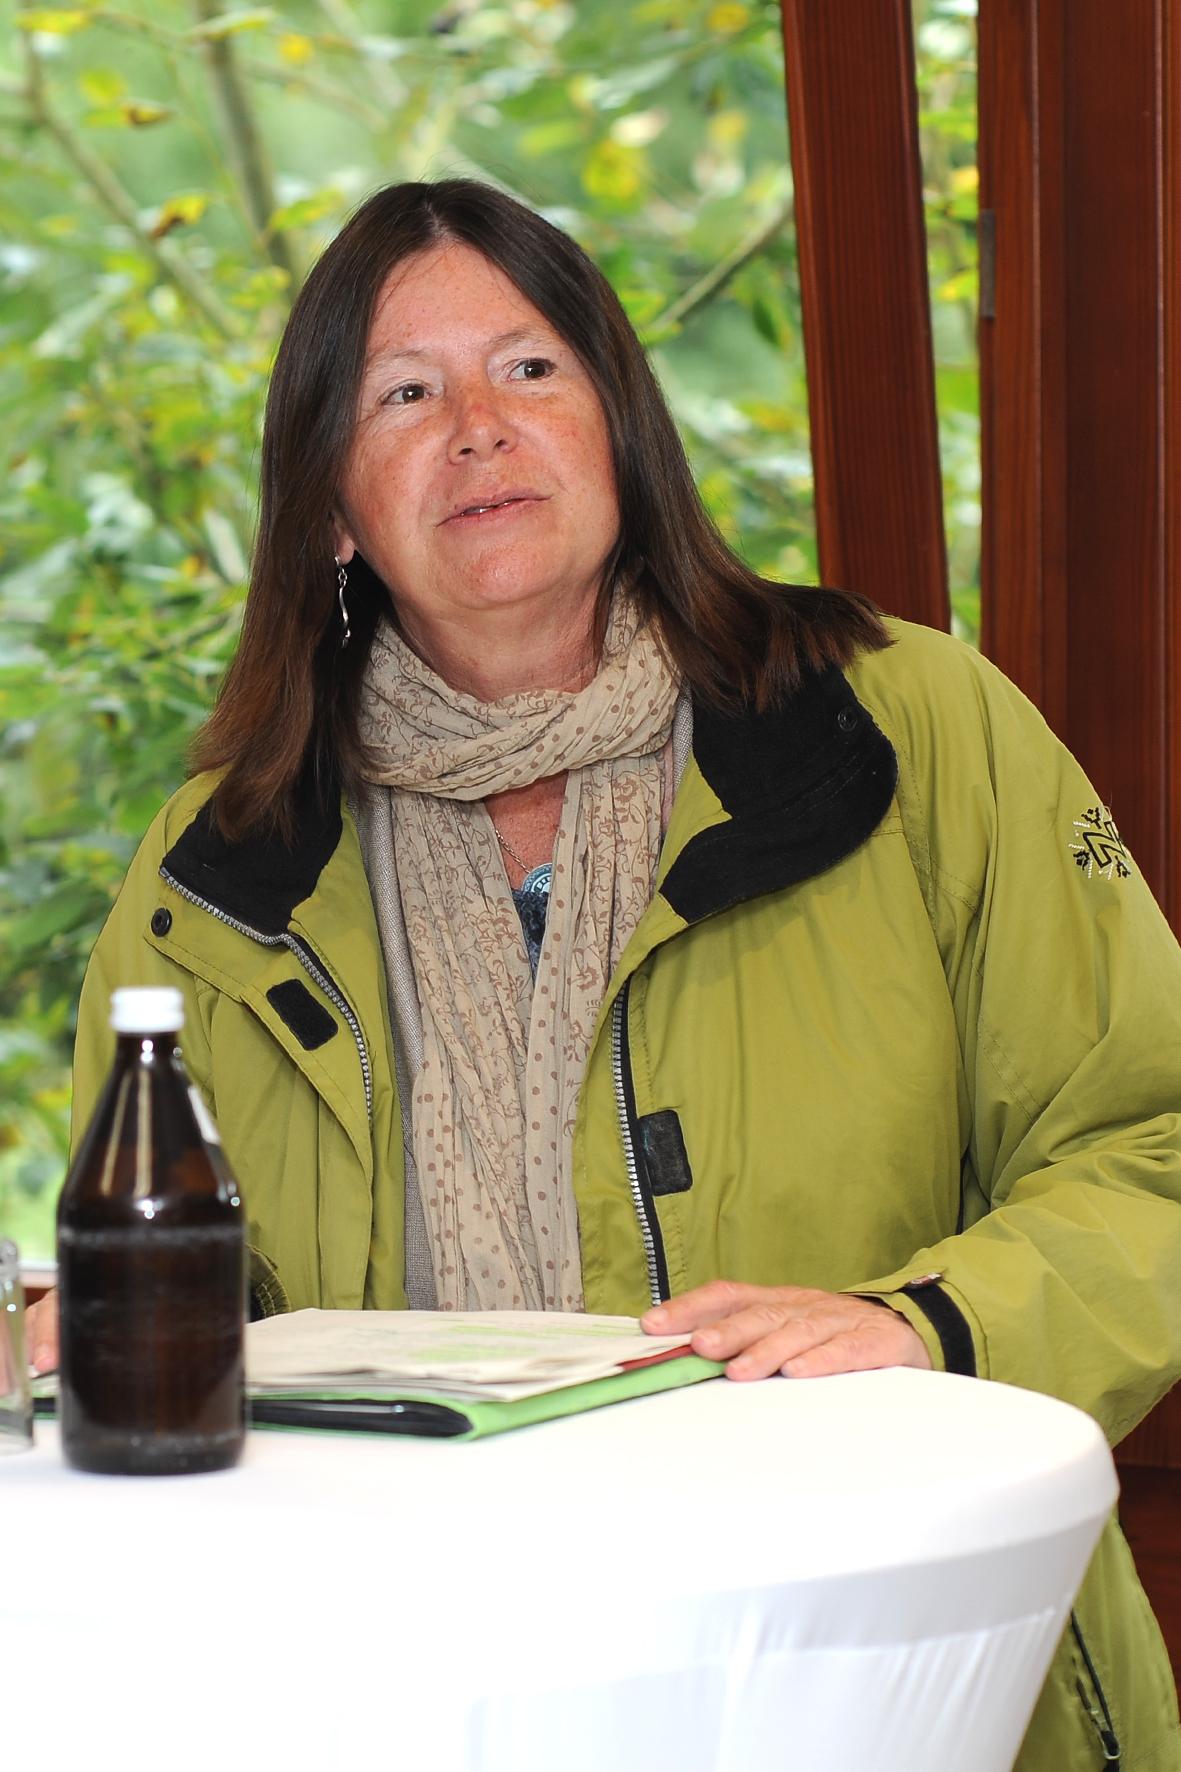 Frau Umweltministerin Hofken 1